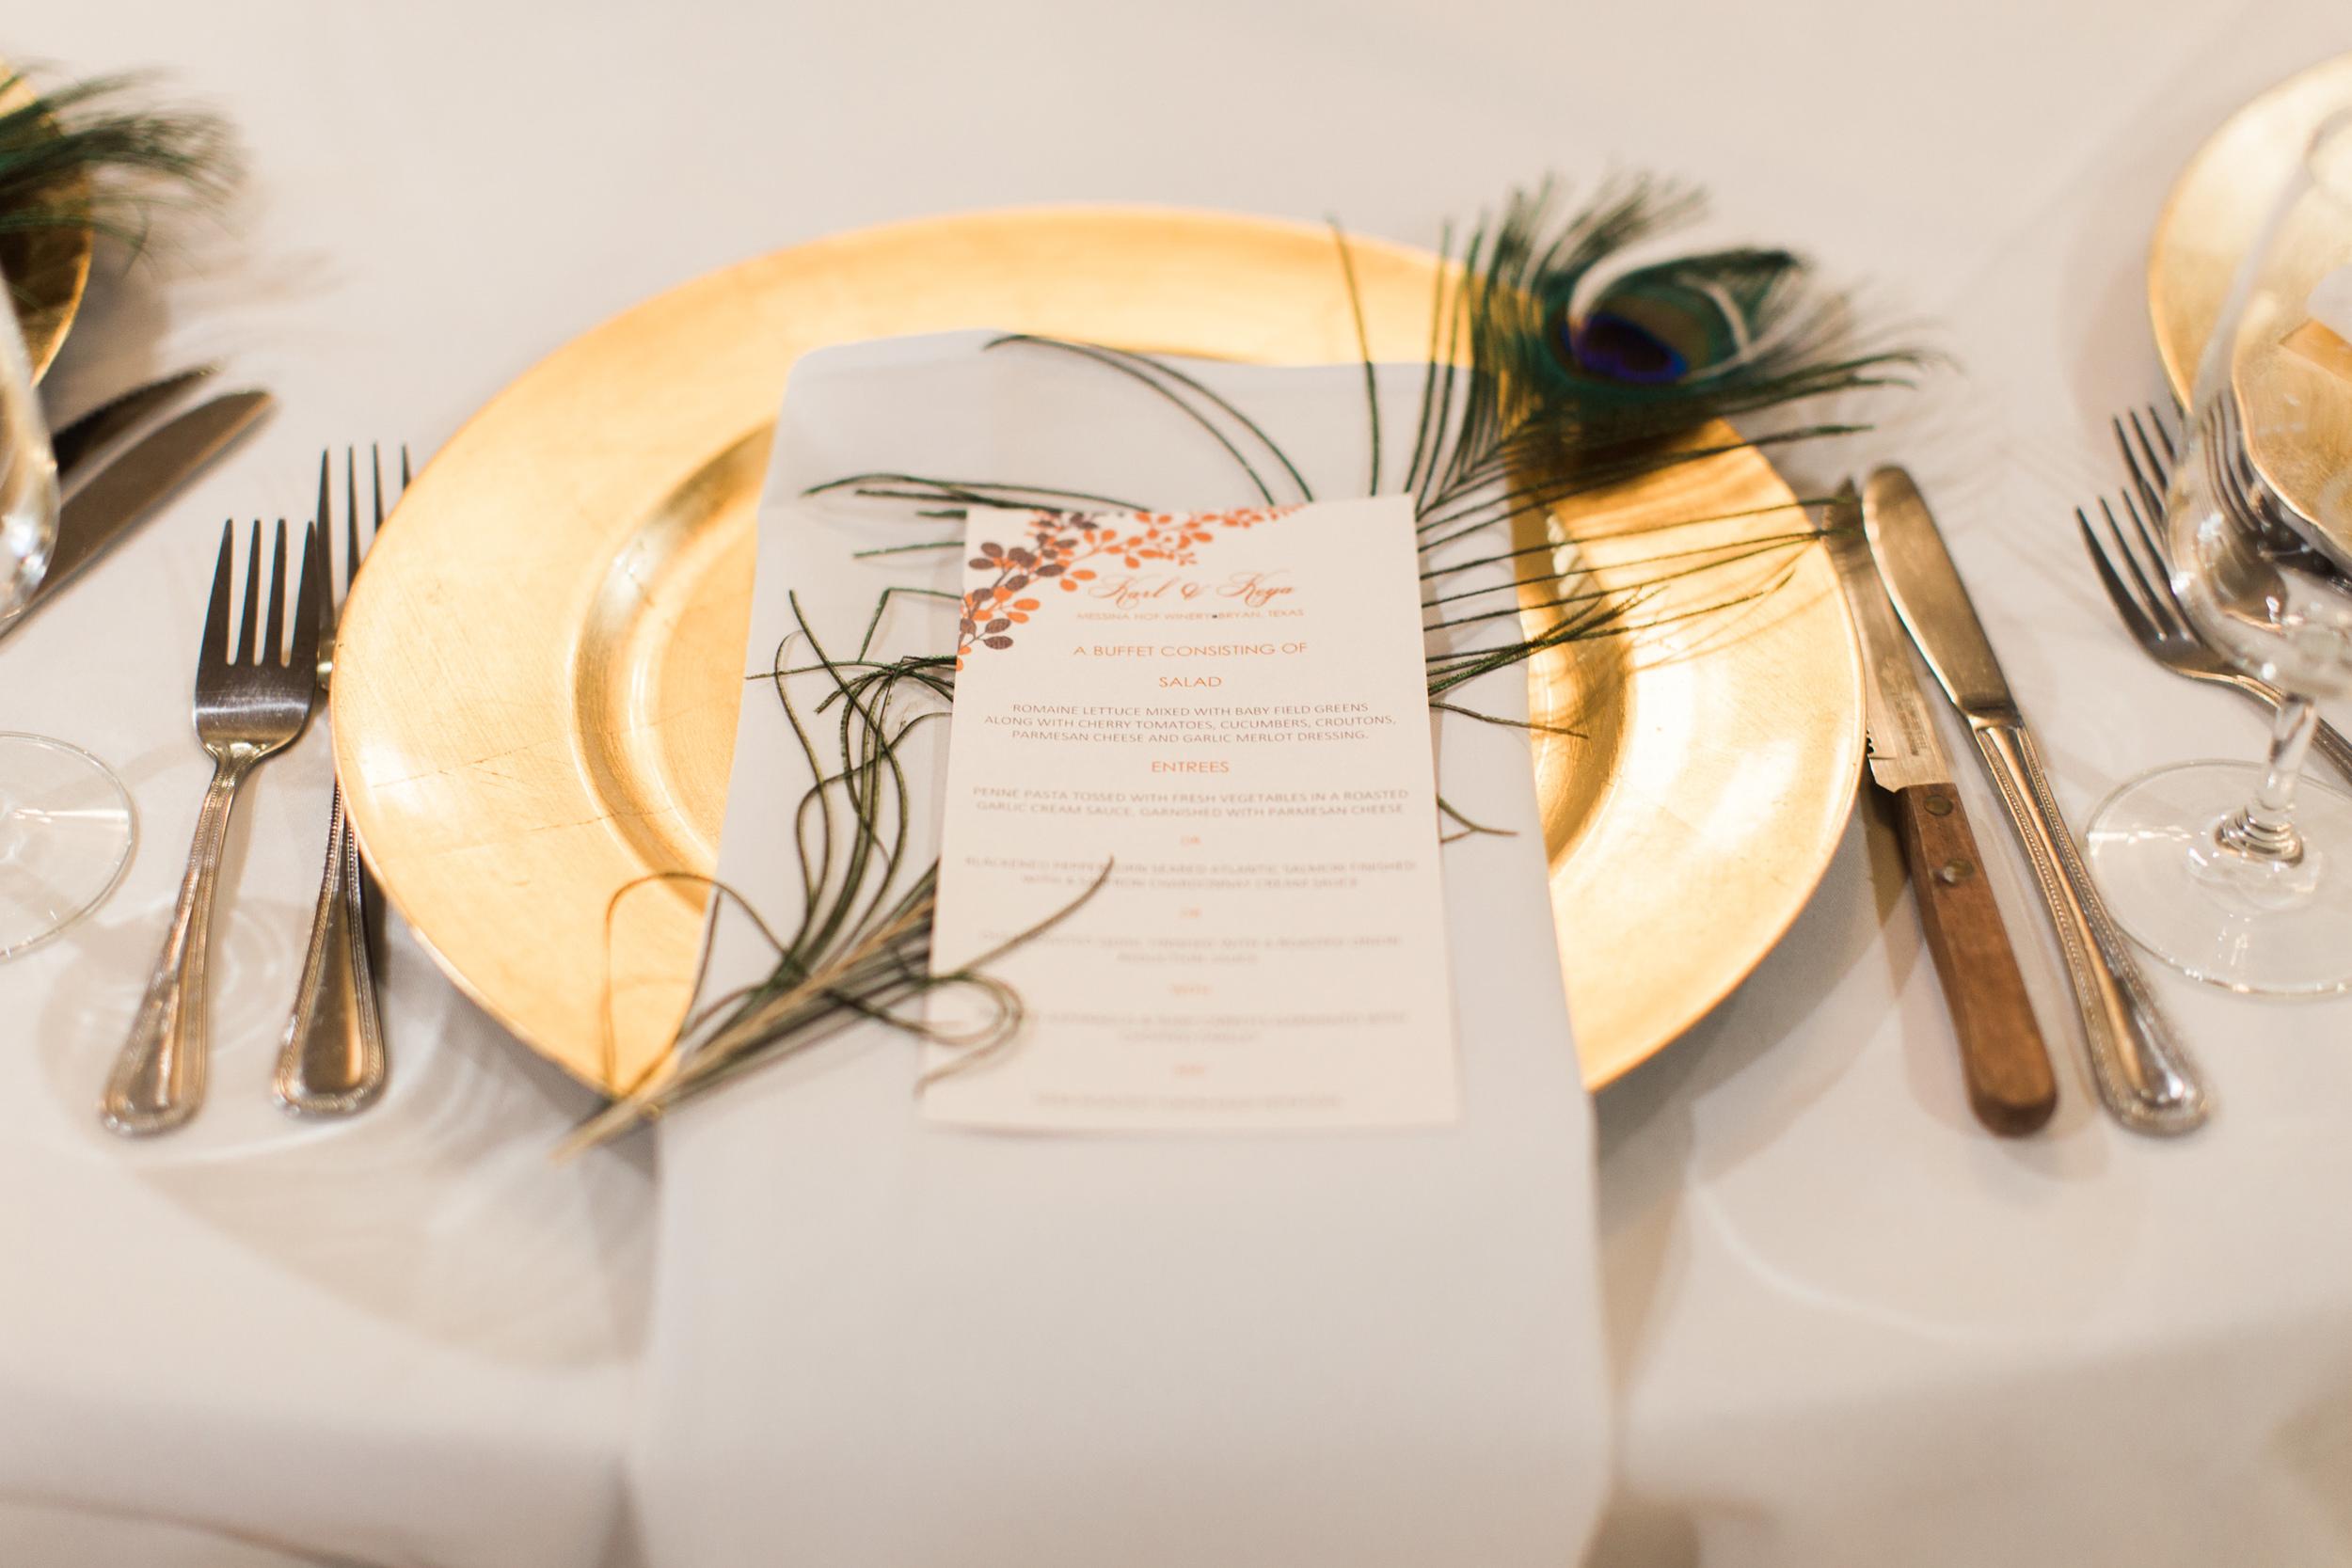 d6898-messina-hof-wedding-47messina-hof-wedding-47.jpg